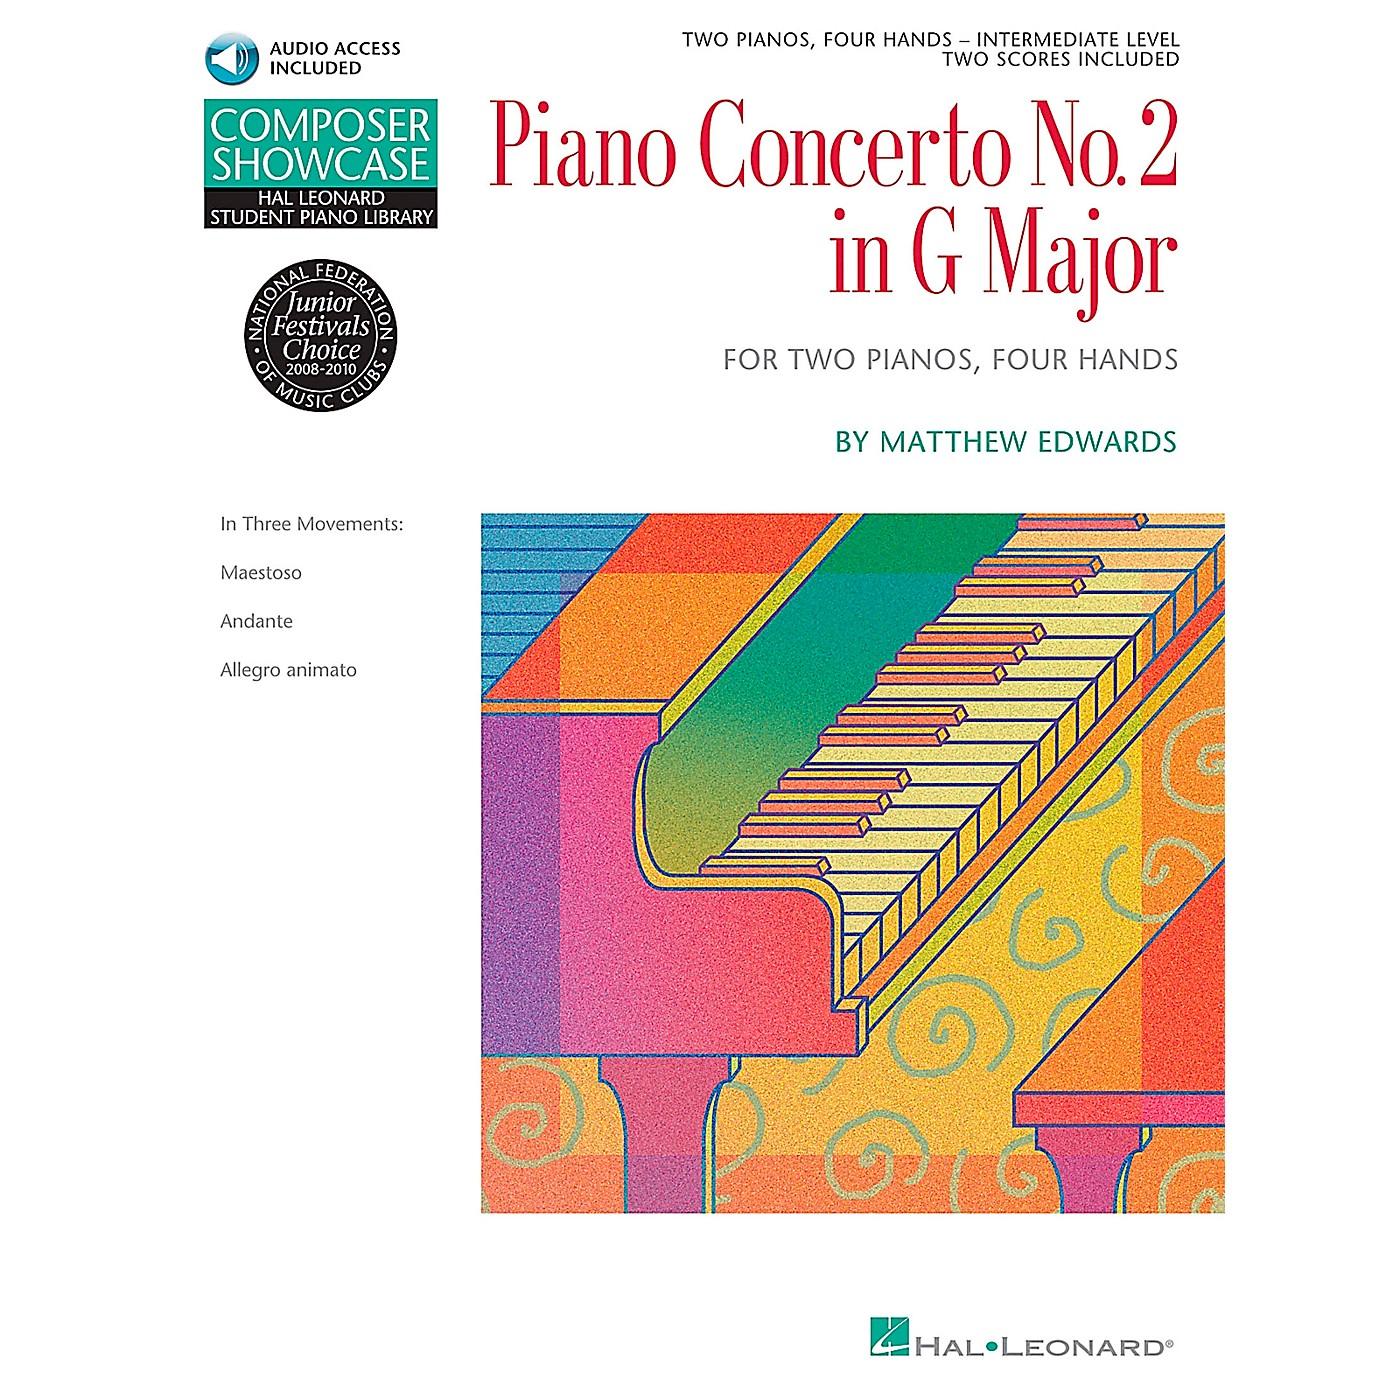 Hal Leonard Piano Concerto No. 2 In G Major 2 Pianos 4 Hands Book/CD Composer Showcase Hal Leonard Student Piano Library by Matt Edwards thumbnail